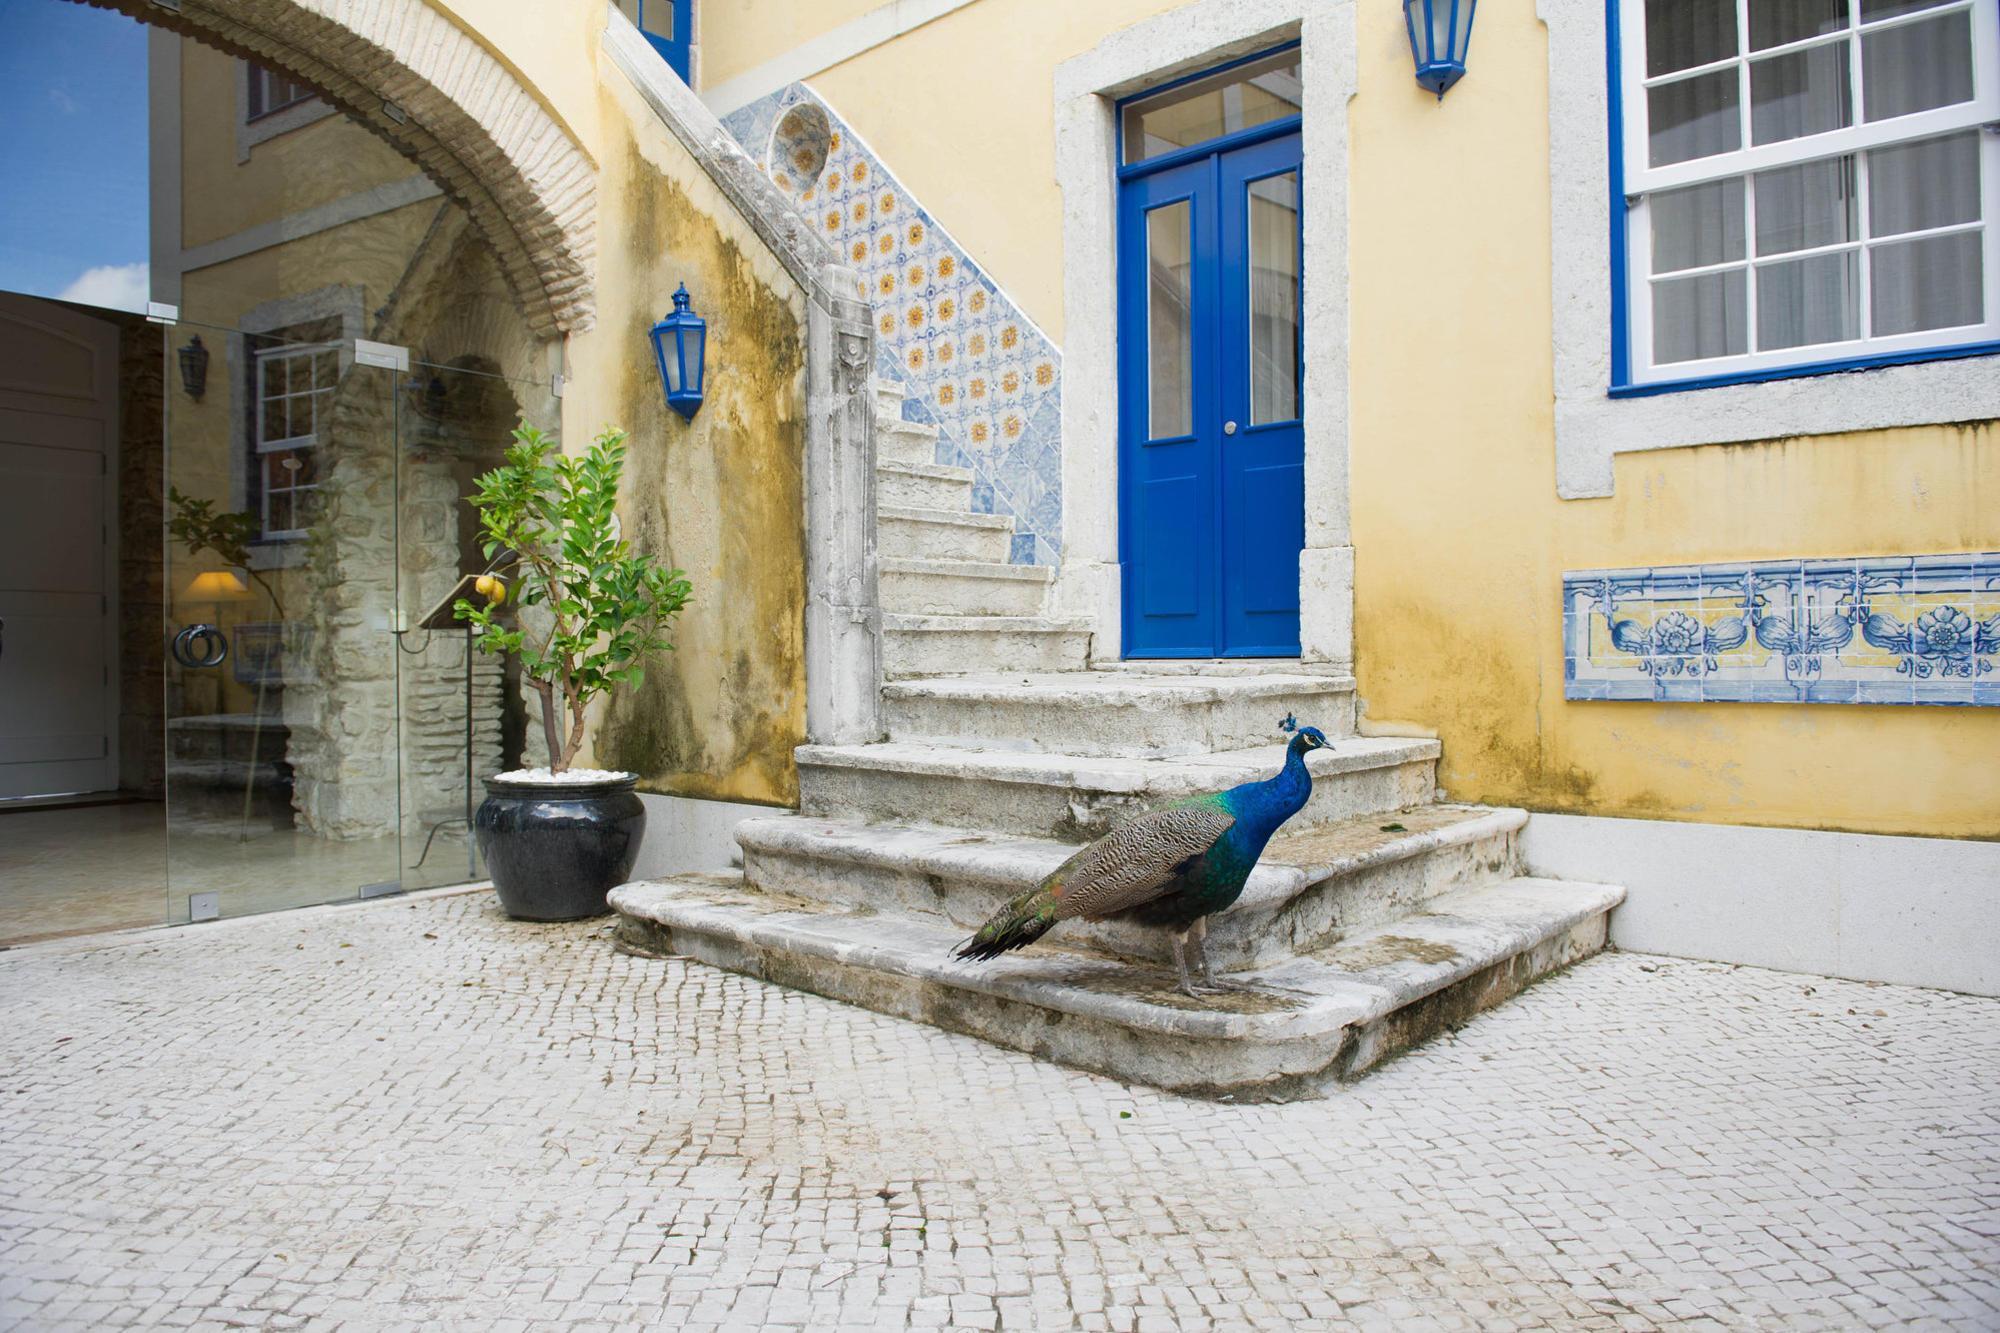 Courtyard and peacocks at Castelo do Solar in Lisbon